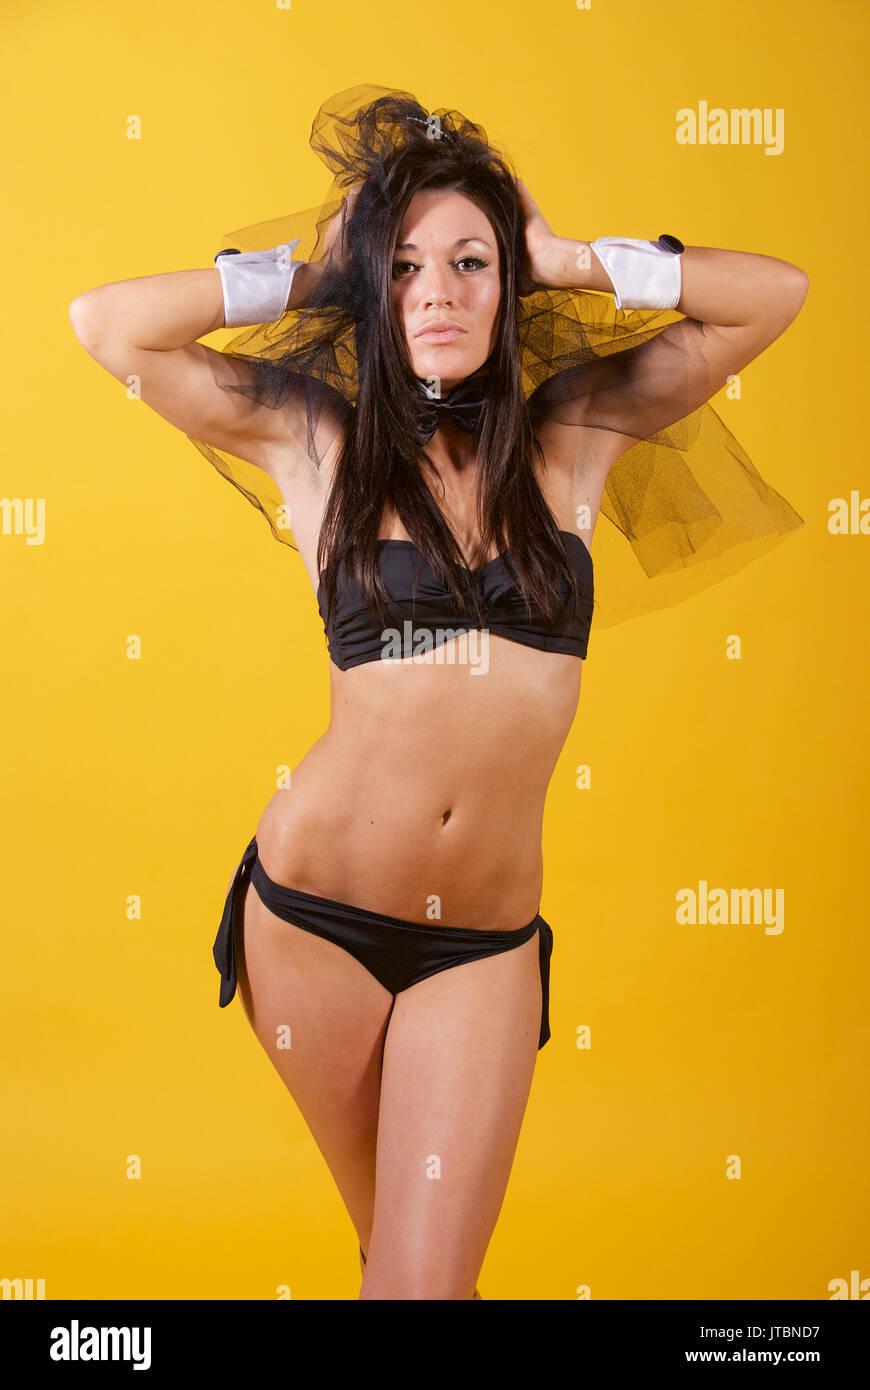 Bikini Imágenes De Stockamp; Brunette Yellow Wearing Female R4Aq5L3j